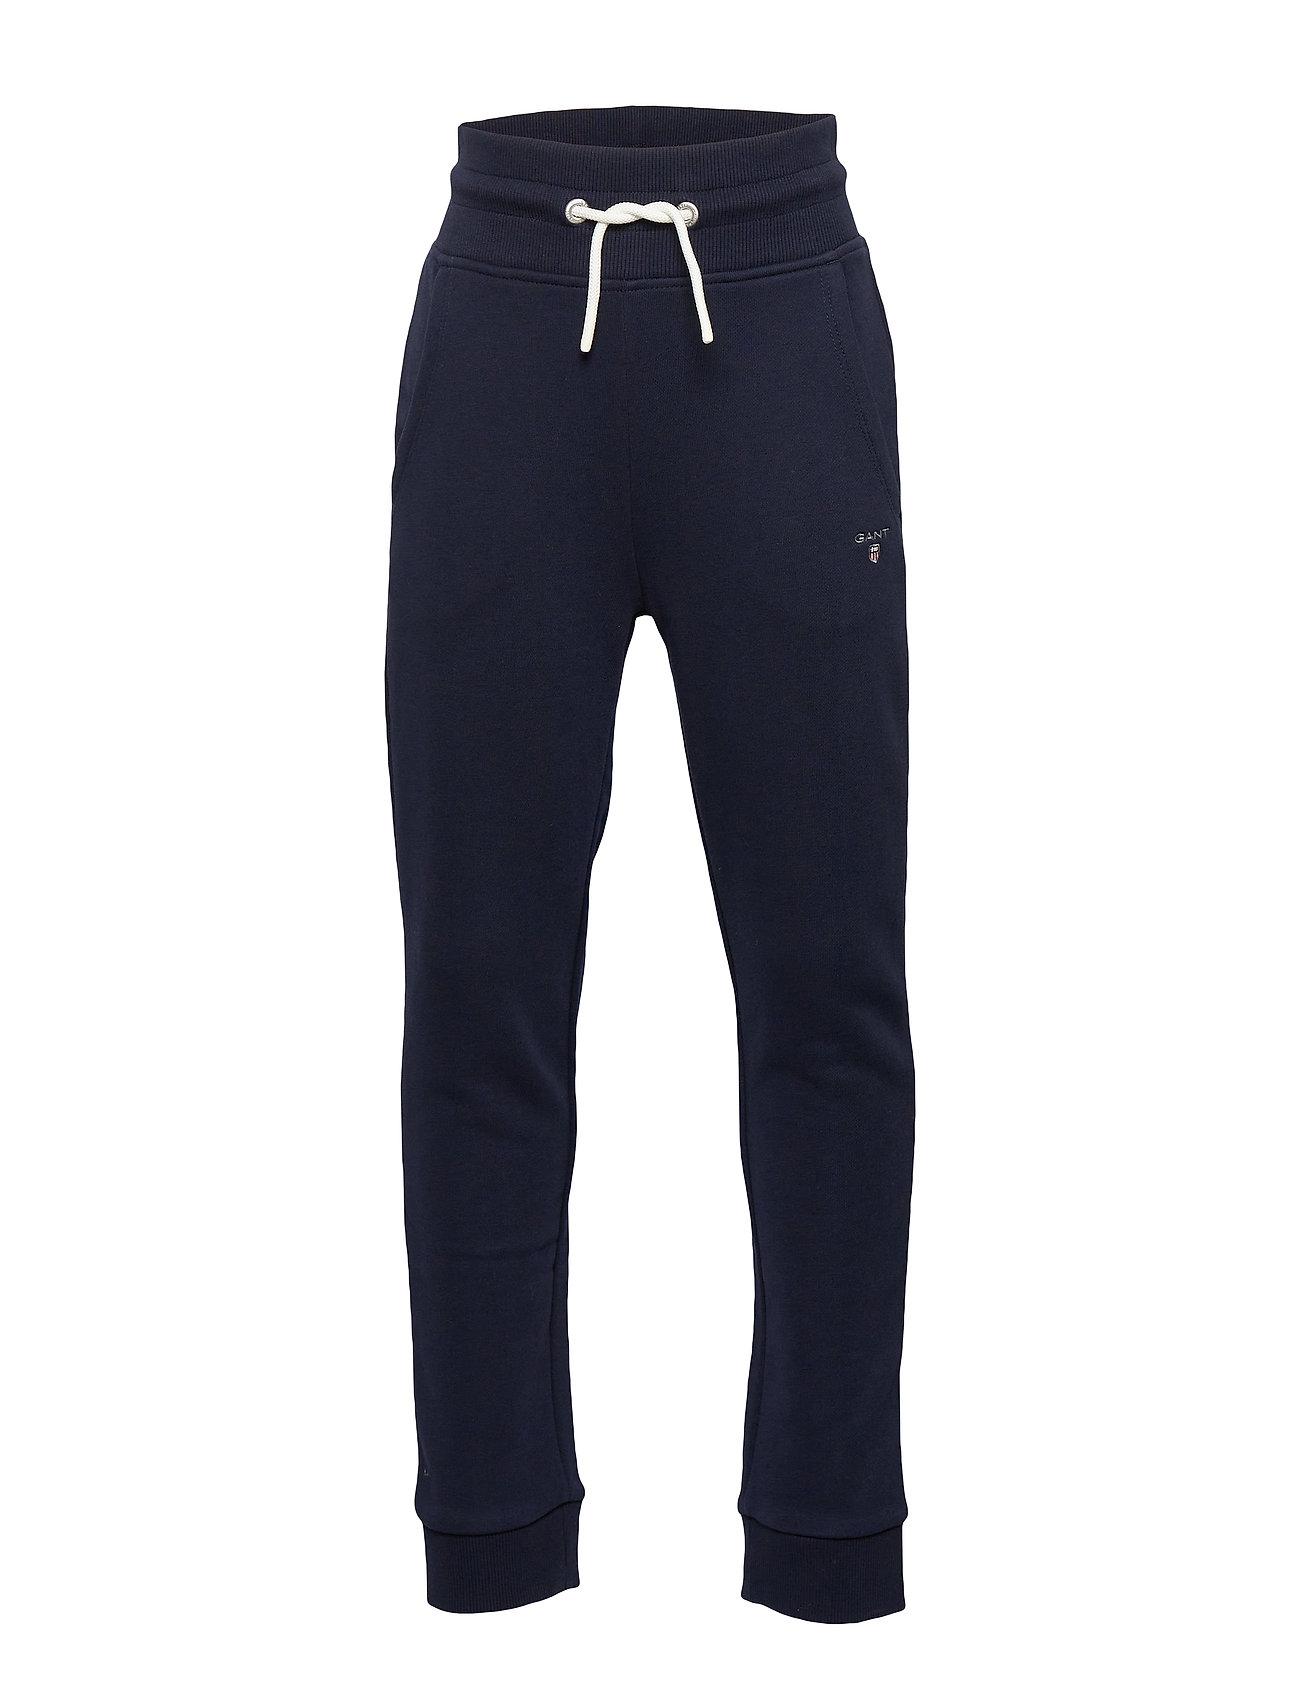 Gant ORIGINAL SWEAT PANTS - EVENING BLUE